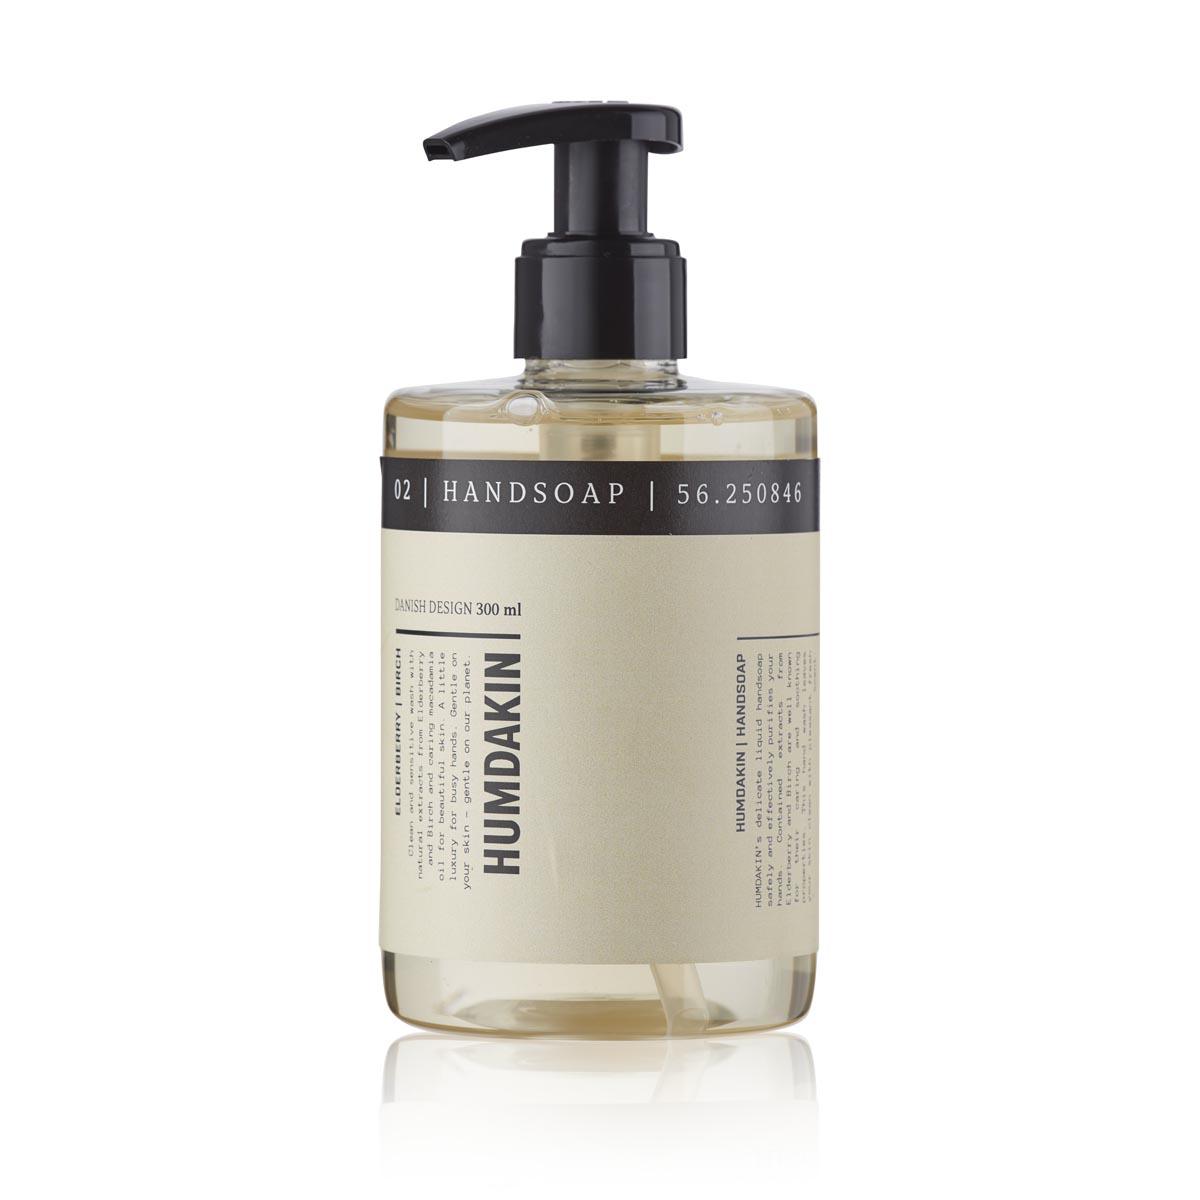 Hand-soap-02-elderberry-birch